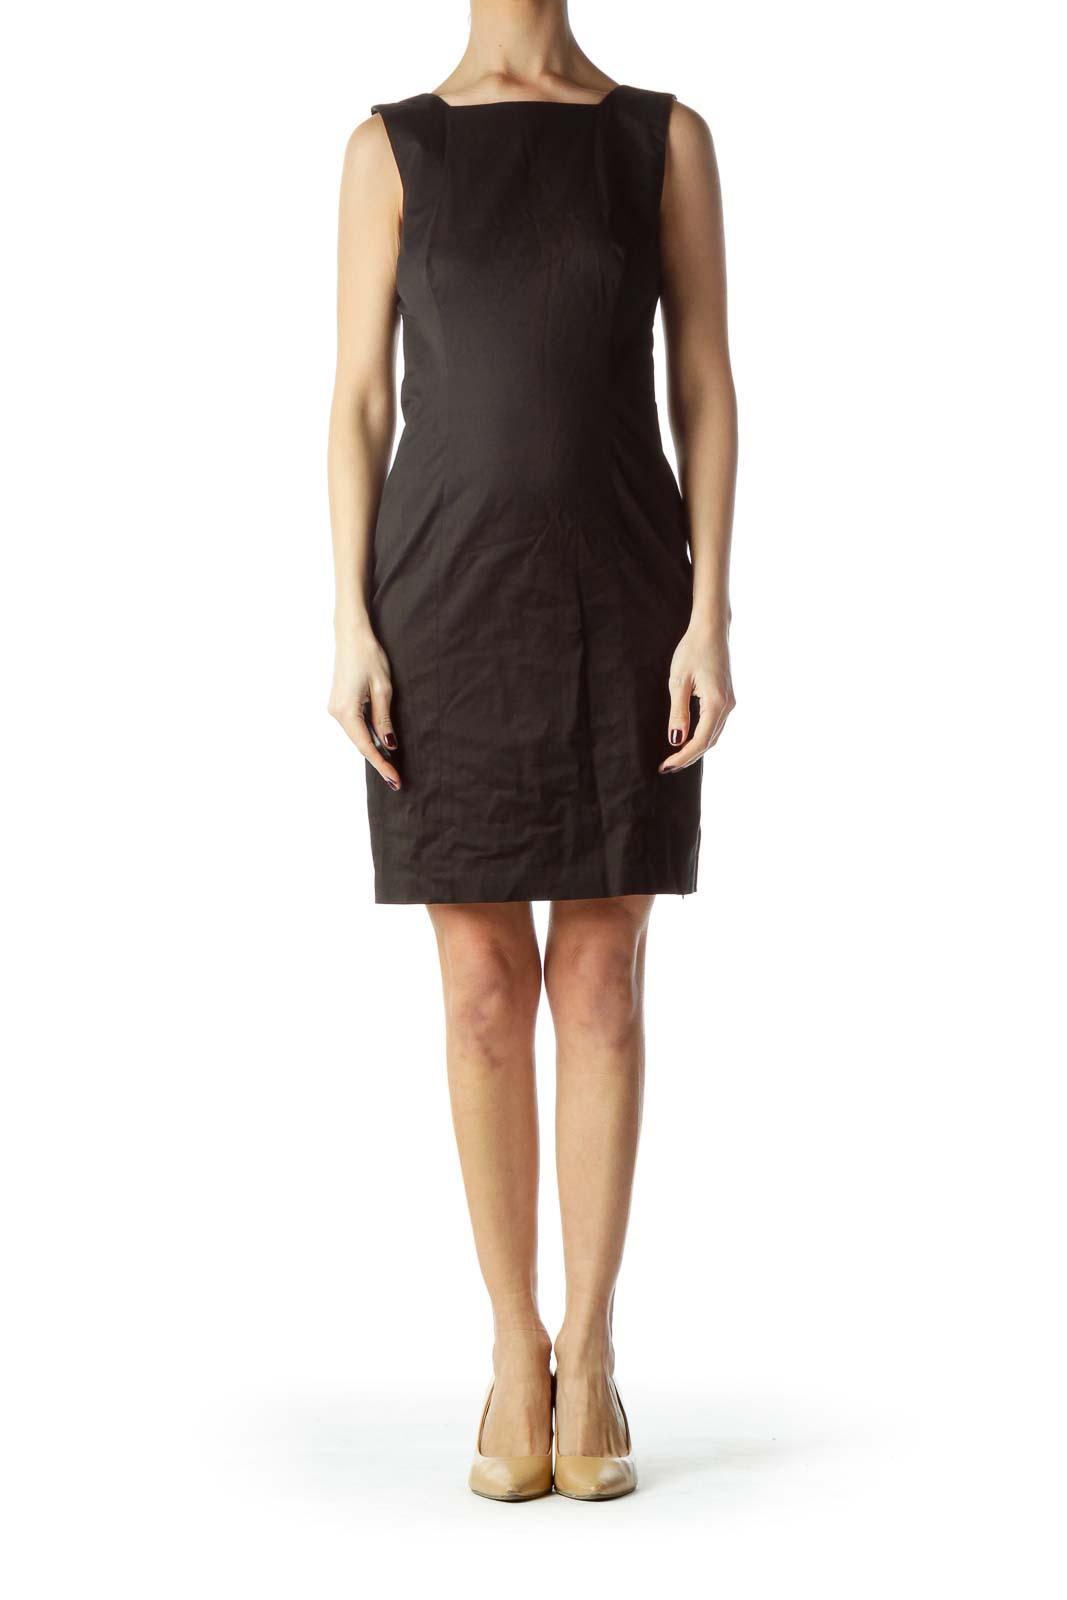 Black Square Neck Sleeveless Work Dress